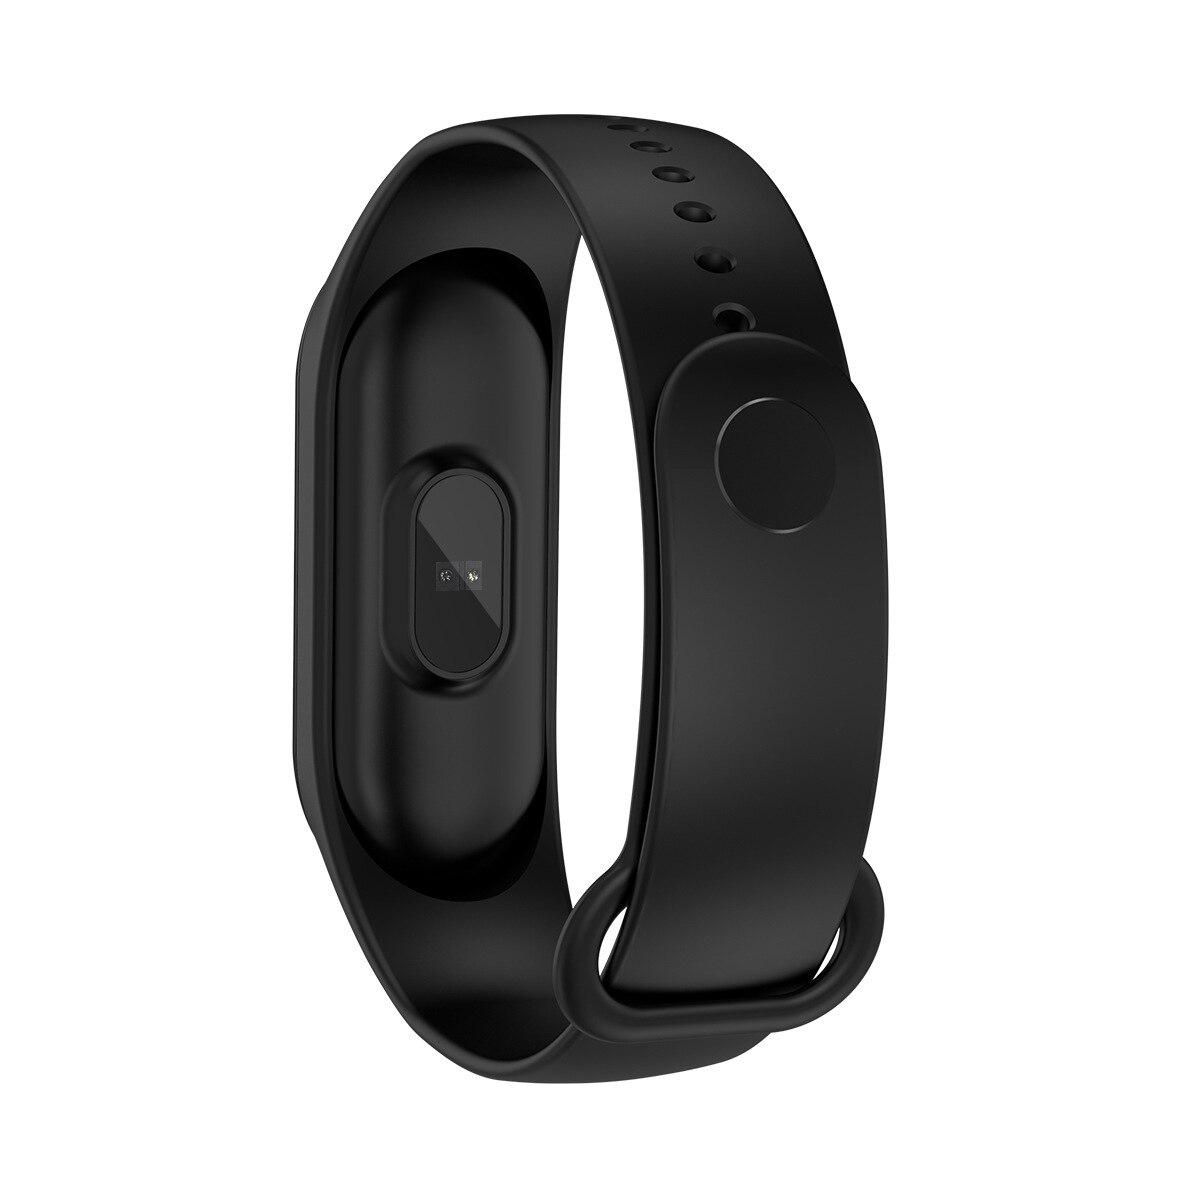 Hce2095851233456e9a2b27bcbaa09c93J New M4 Smart Band Fitness Tracker Smart Watch Sport Smart Bracelet Heart Rate Blood Pressure Smartband Monitor Health Wristband